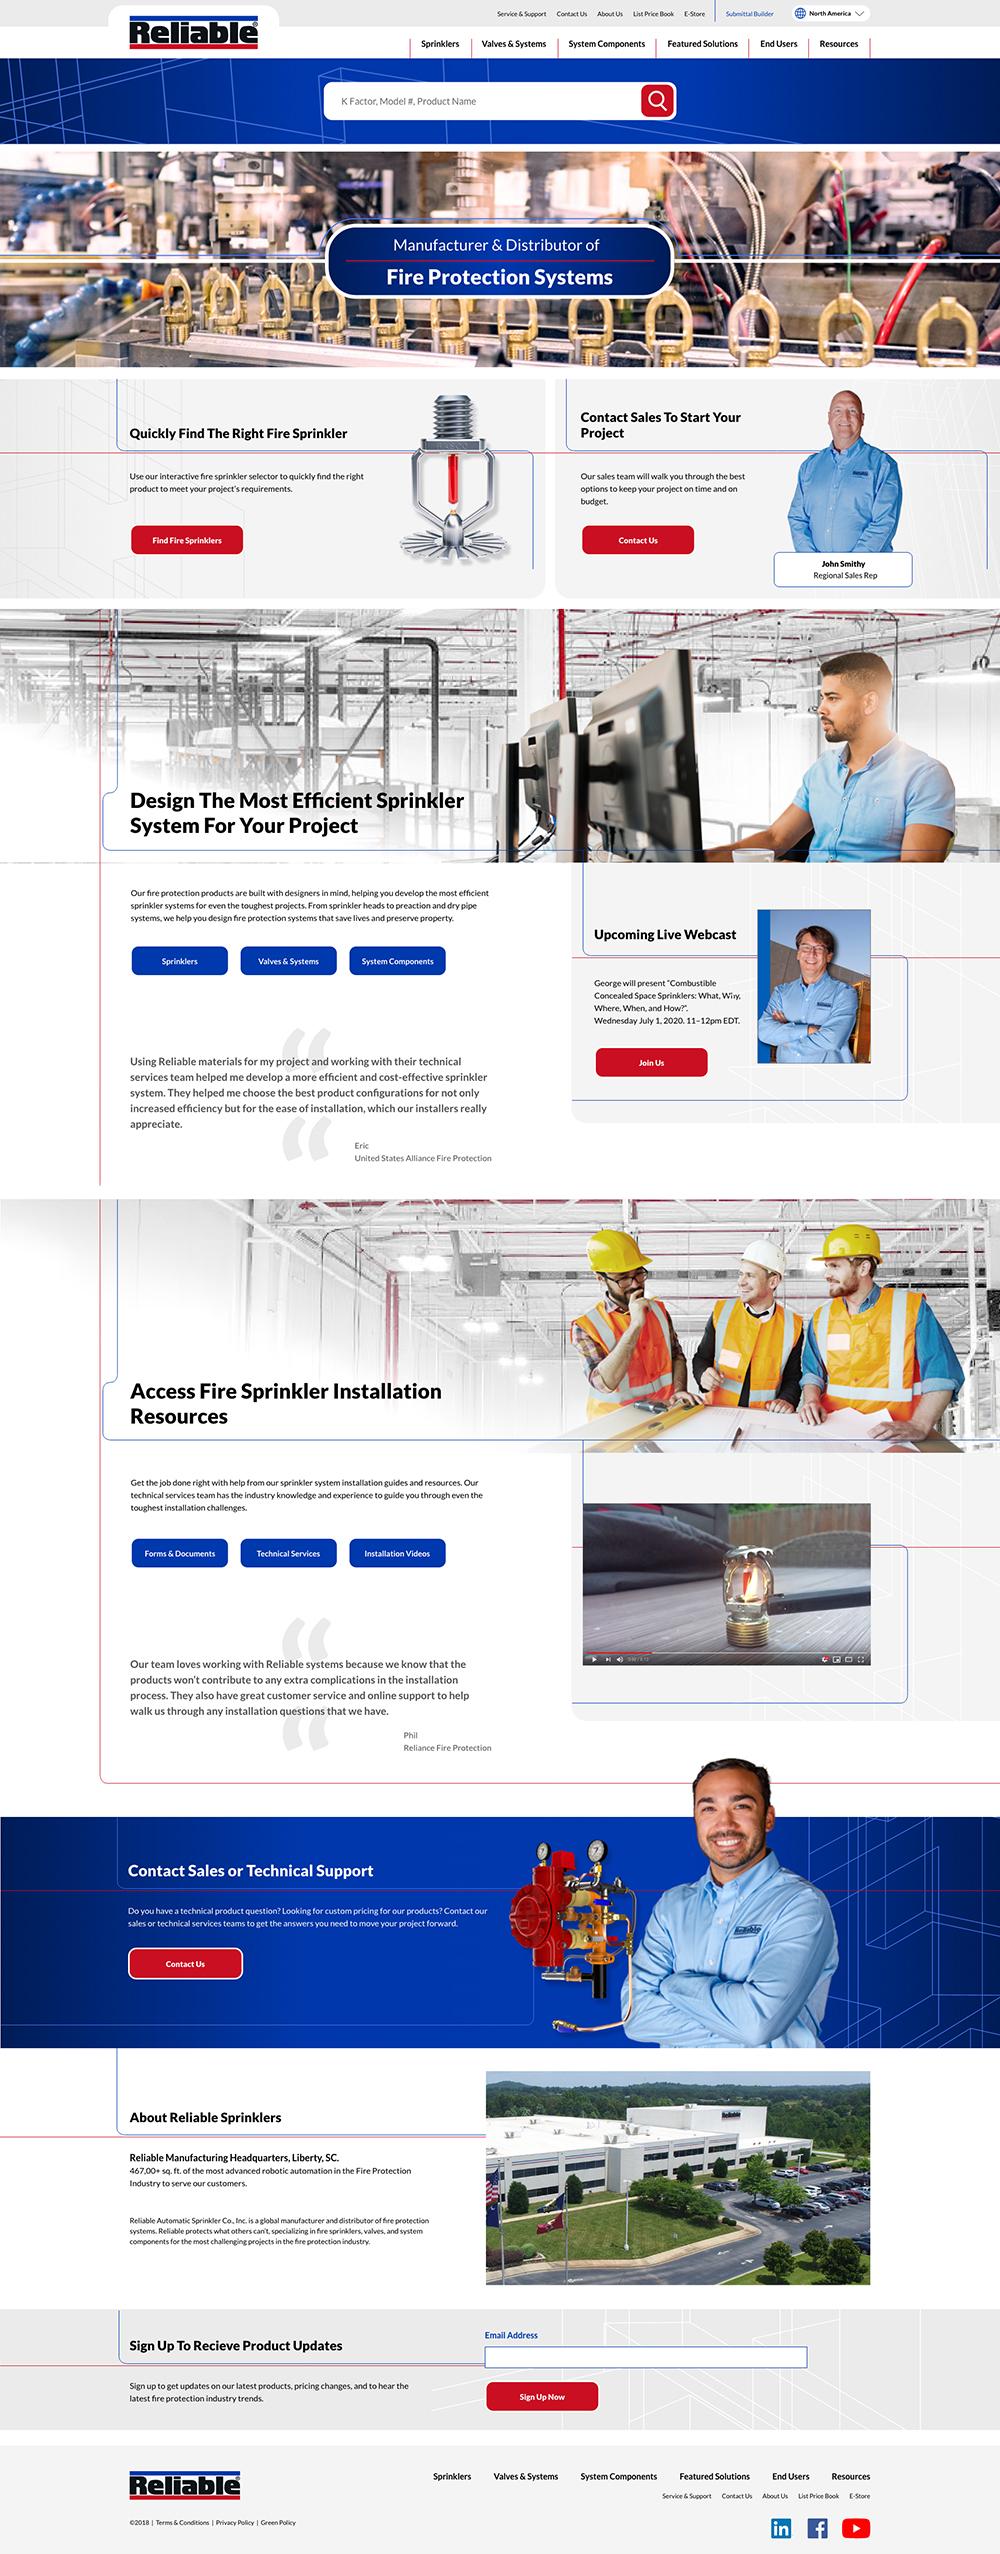 Reliable homepage screenshot